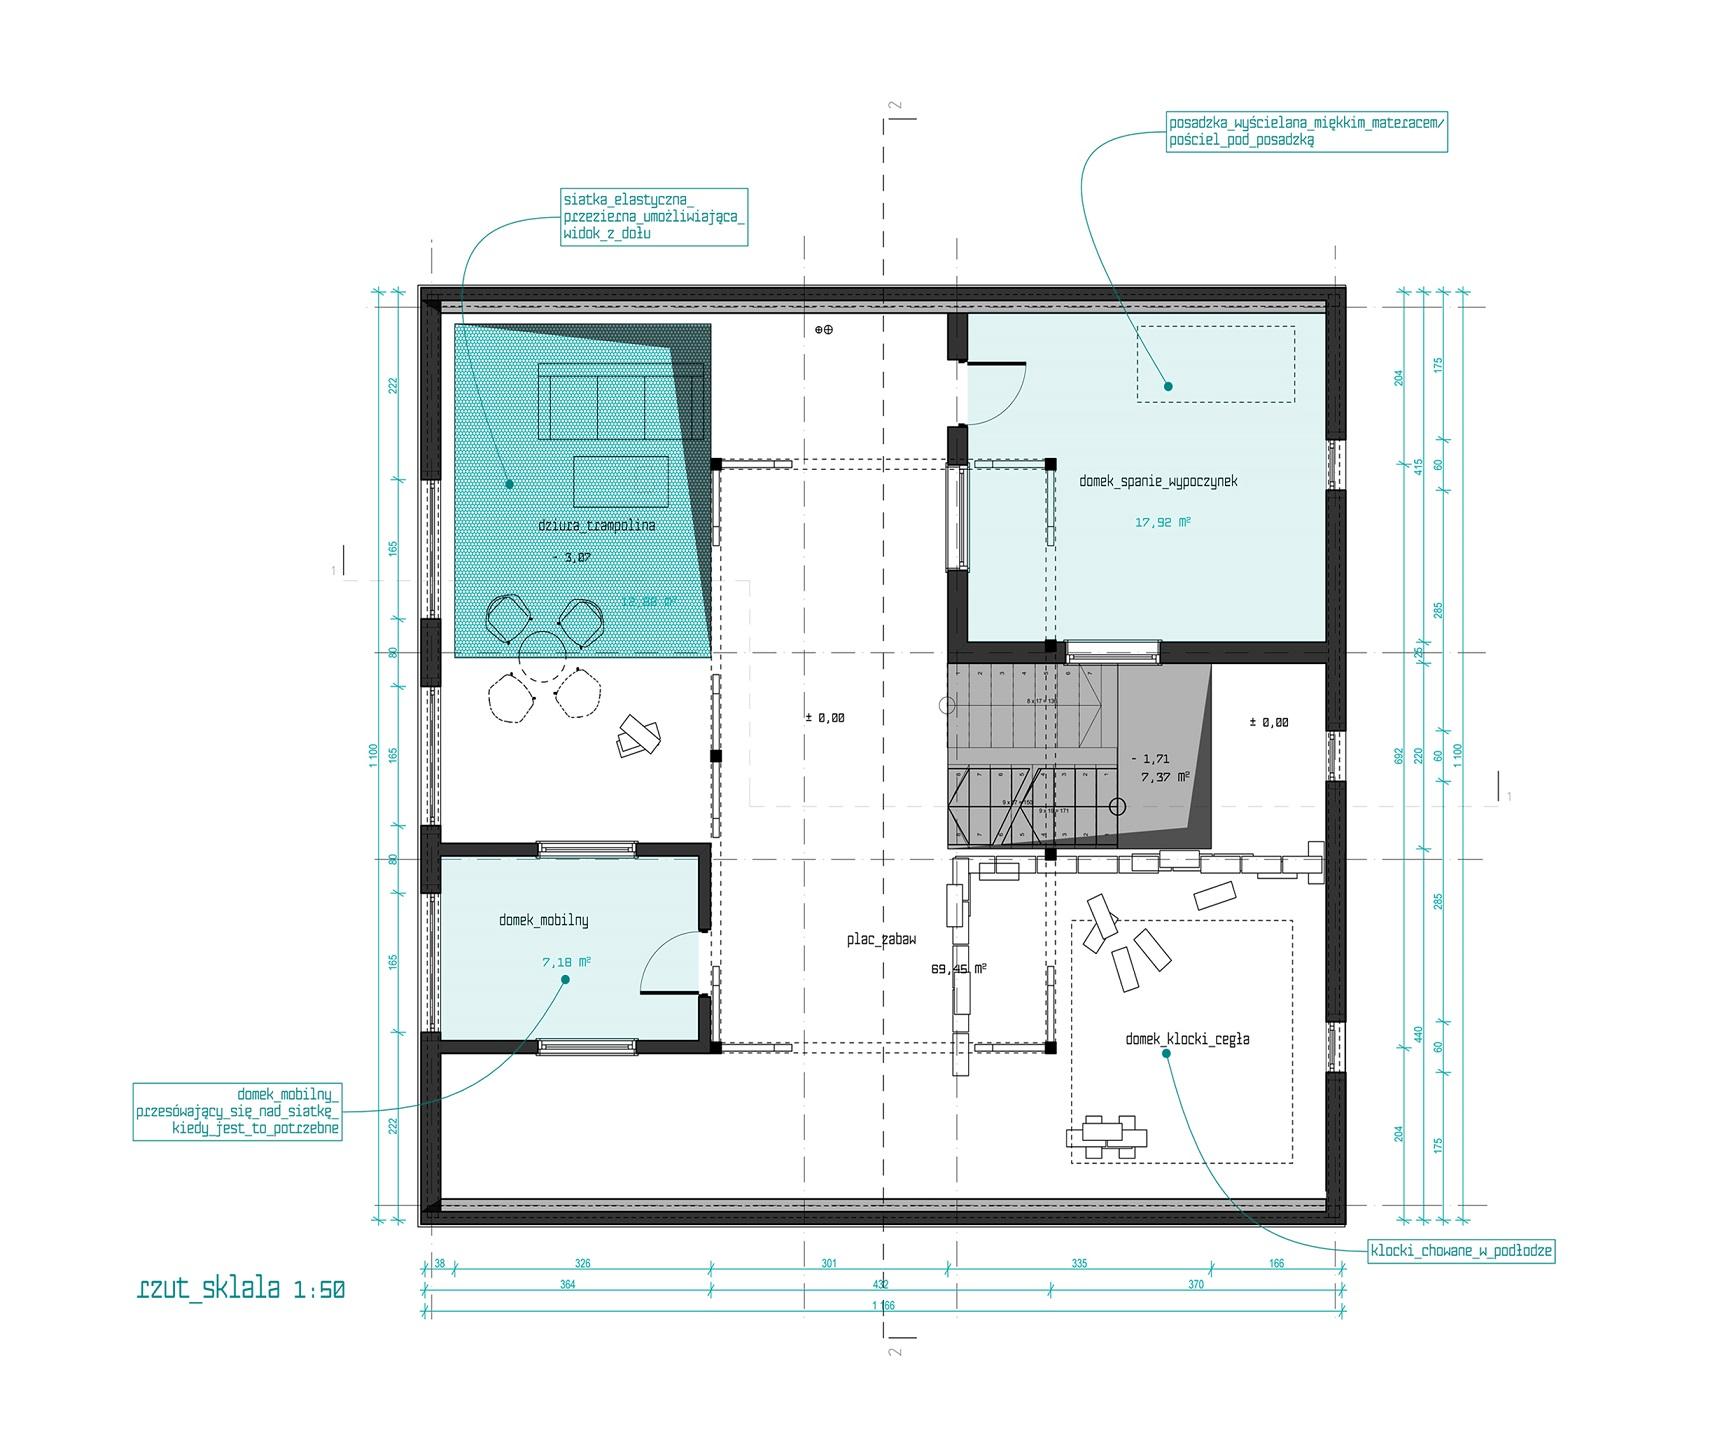 KB08 ARCHITEKT | SENSEGROUP | PSZCZYNA